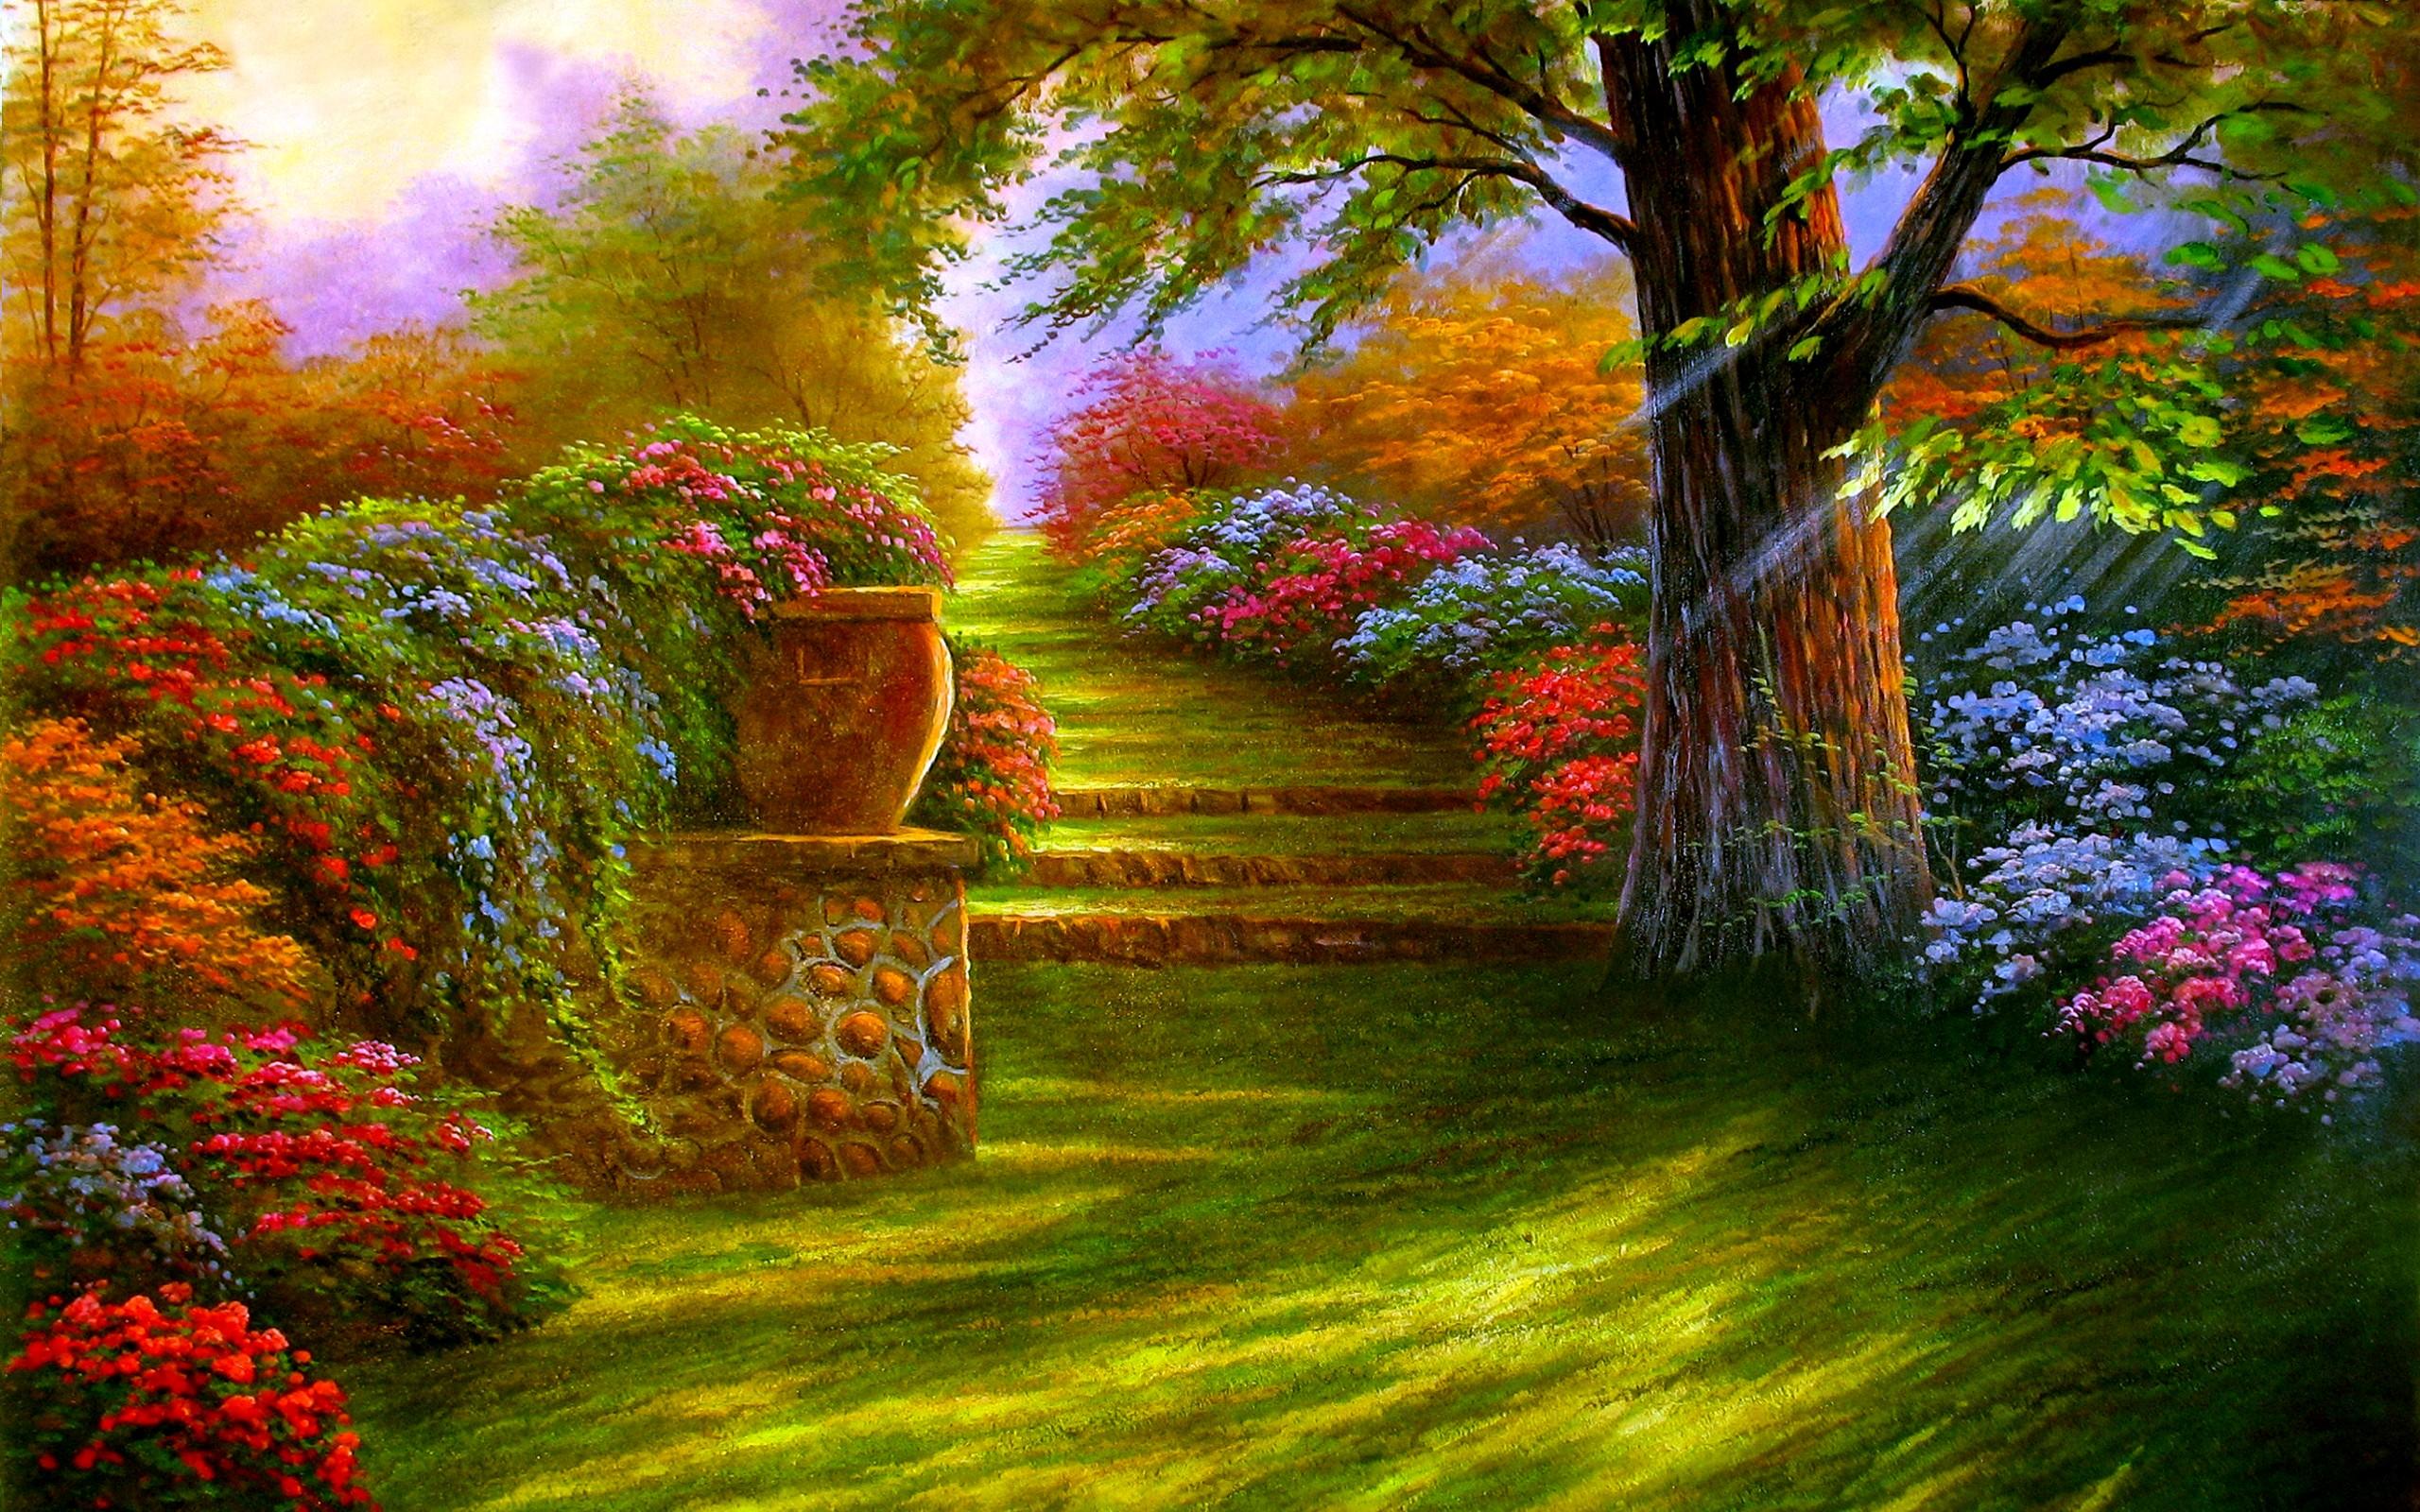 Inspirational Wallpapers With Quotes High Resolution Garden Wallpapers Hd Pixelstalk Net